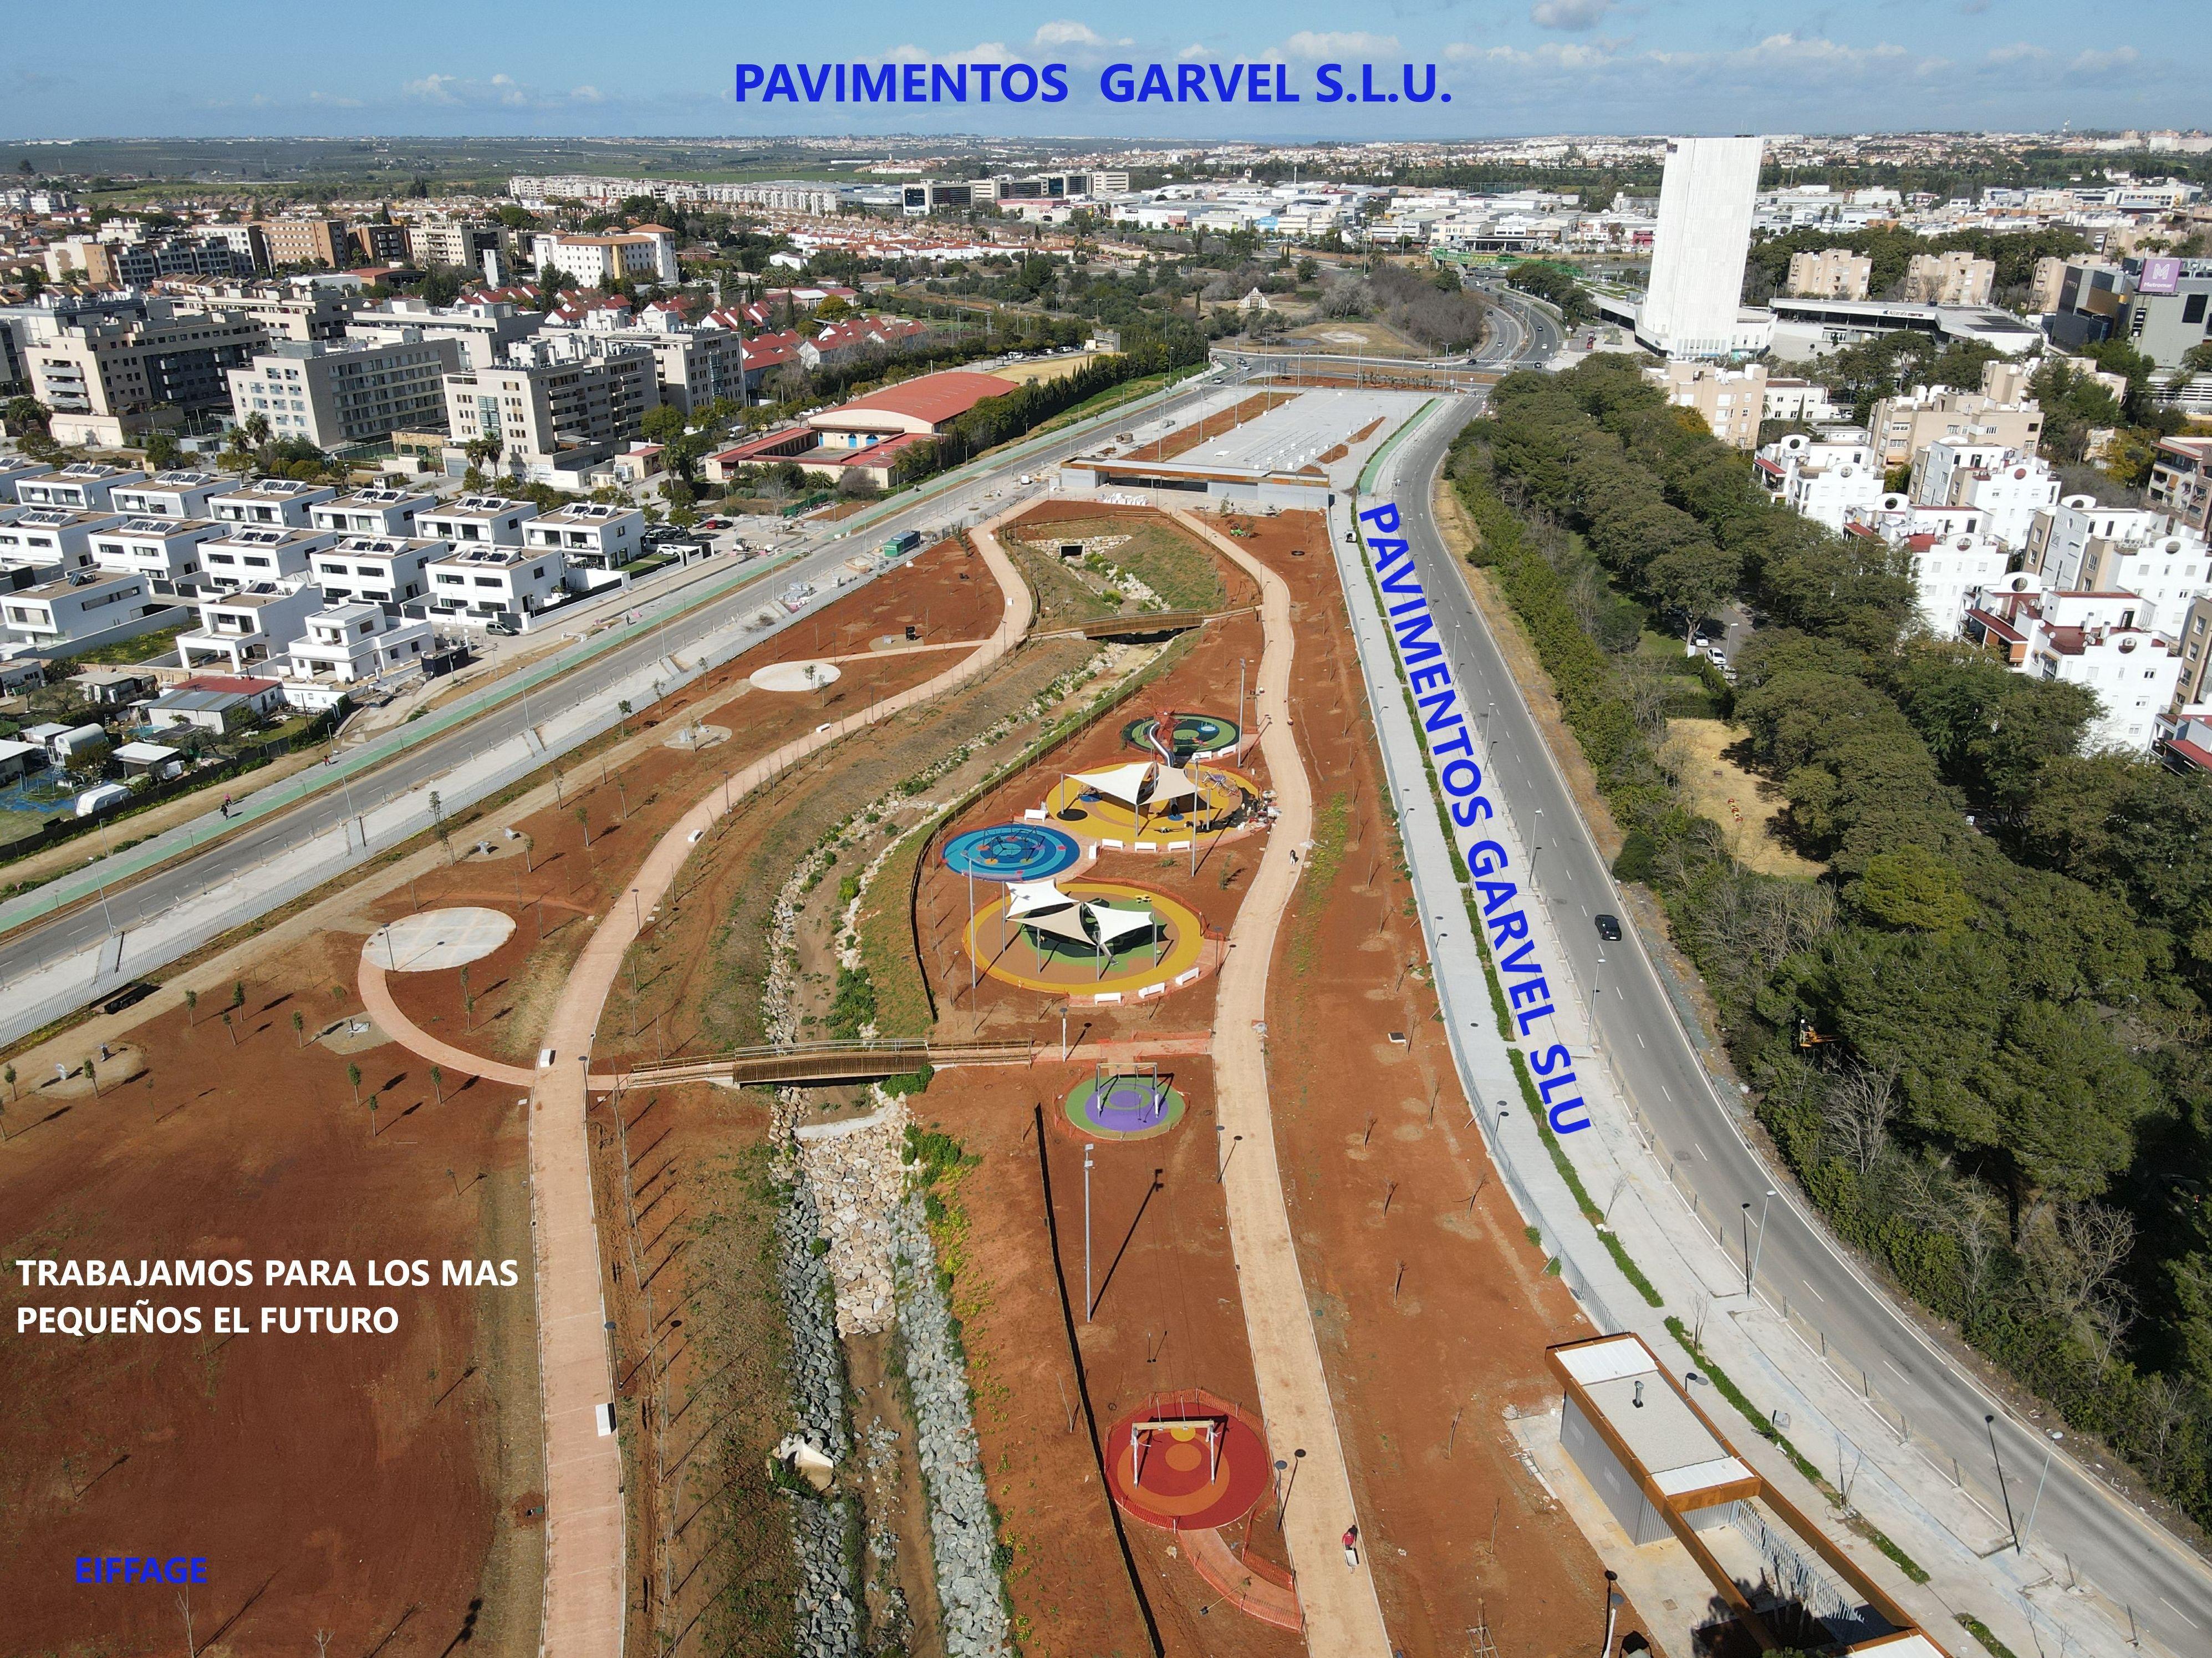 Foto 2 de Instalación de pavimentos de caucho para parques infantiles en Las Cabezas de San Juan | Pavimentos Garvel